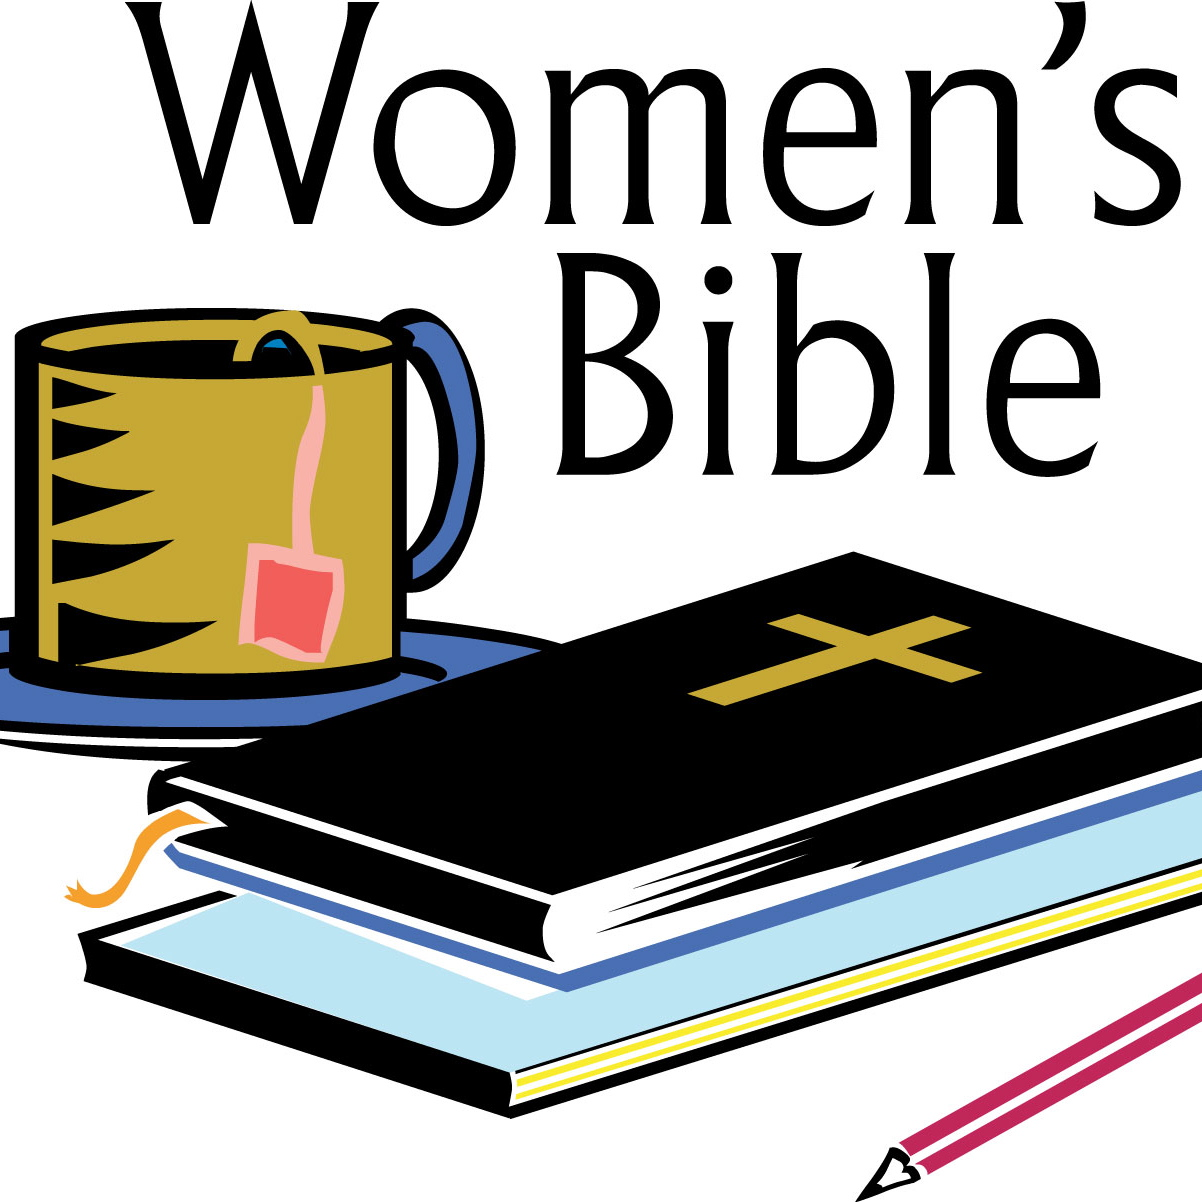 Womens Bible Study Clipart #1